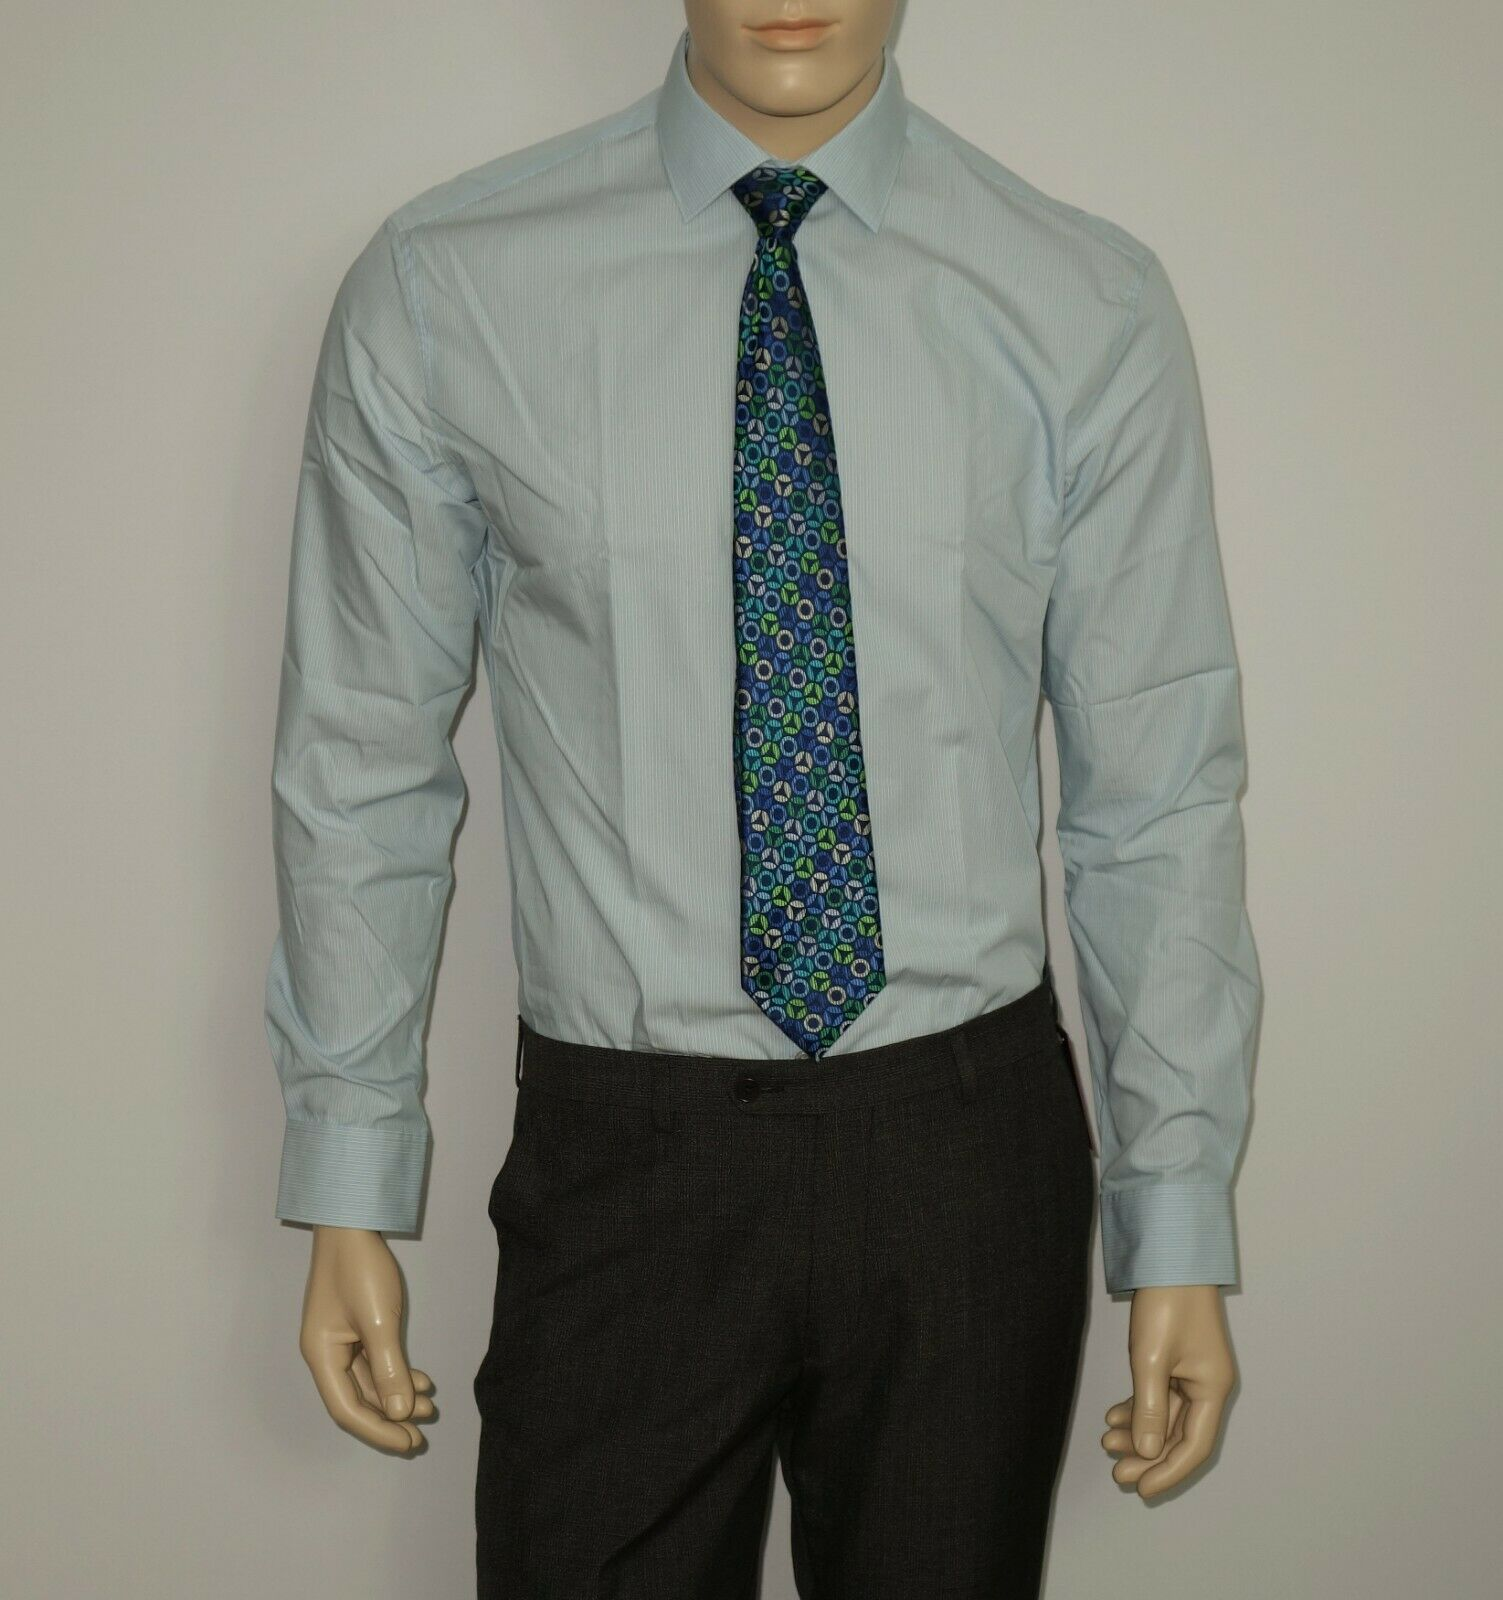 NEW John Varvatos Dress Shirt in Stonehedge 15x34-35 SLIM Fit Button-Down